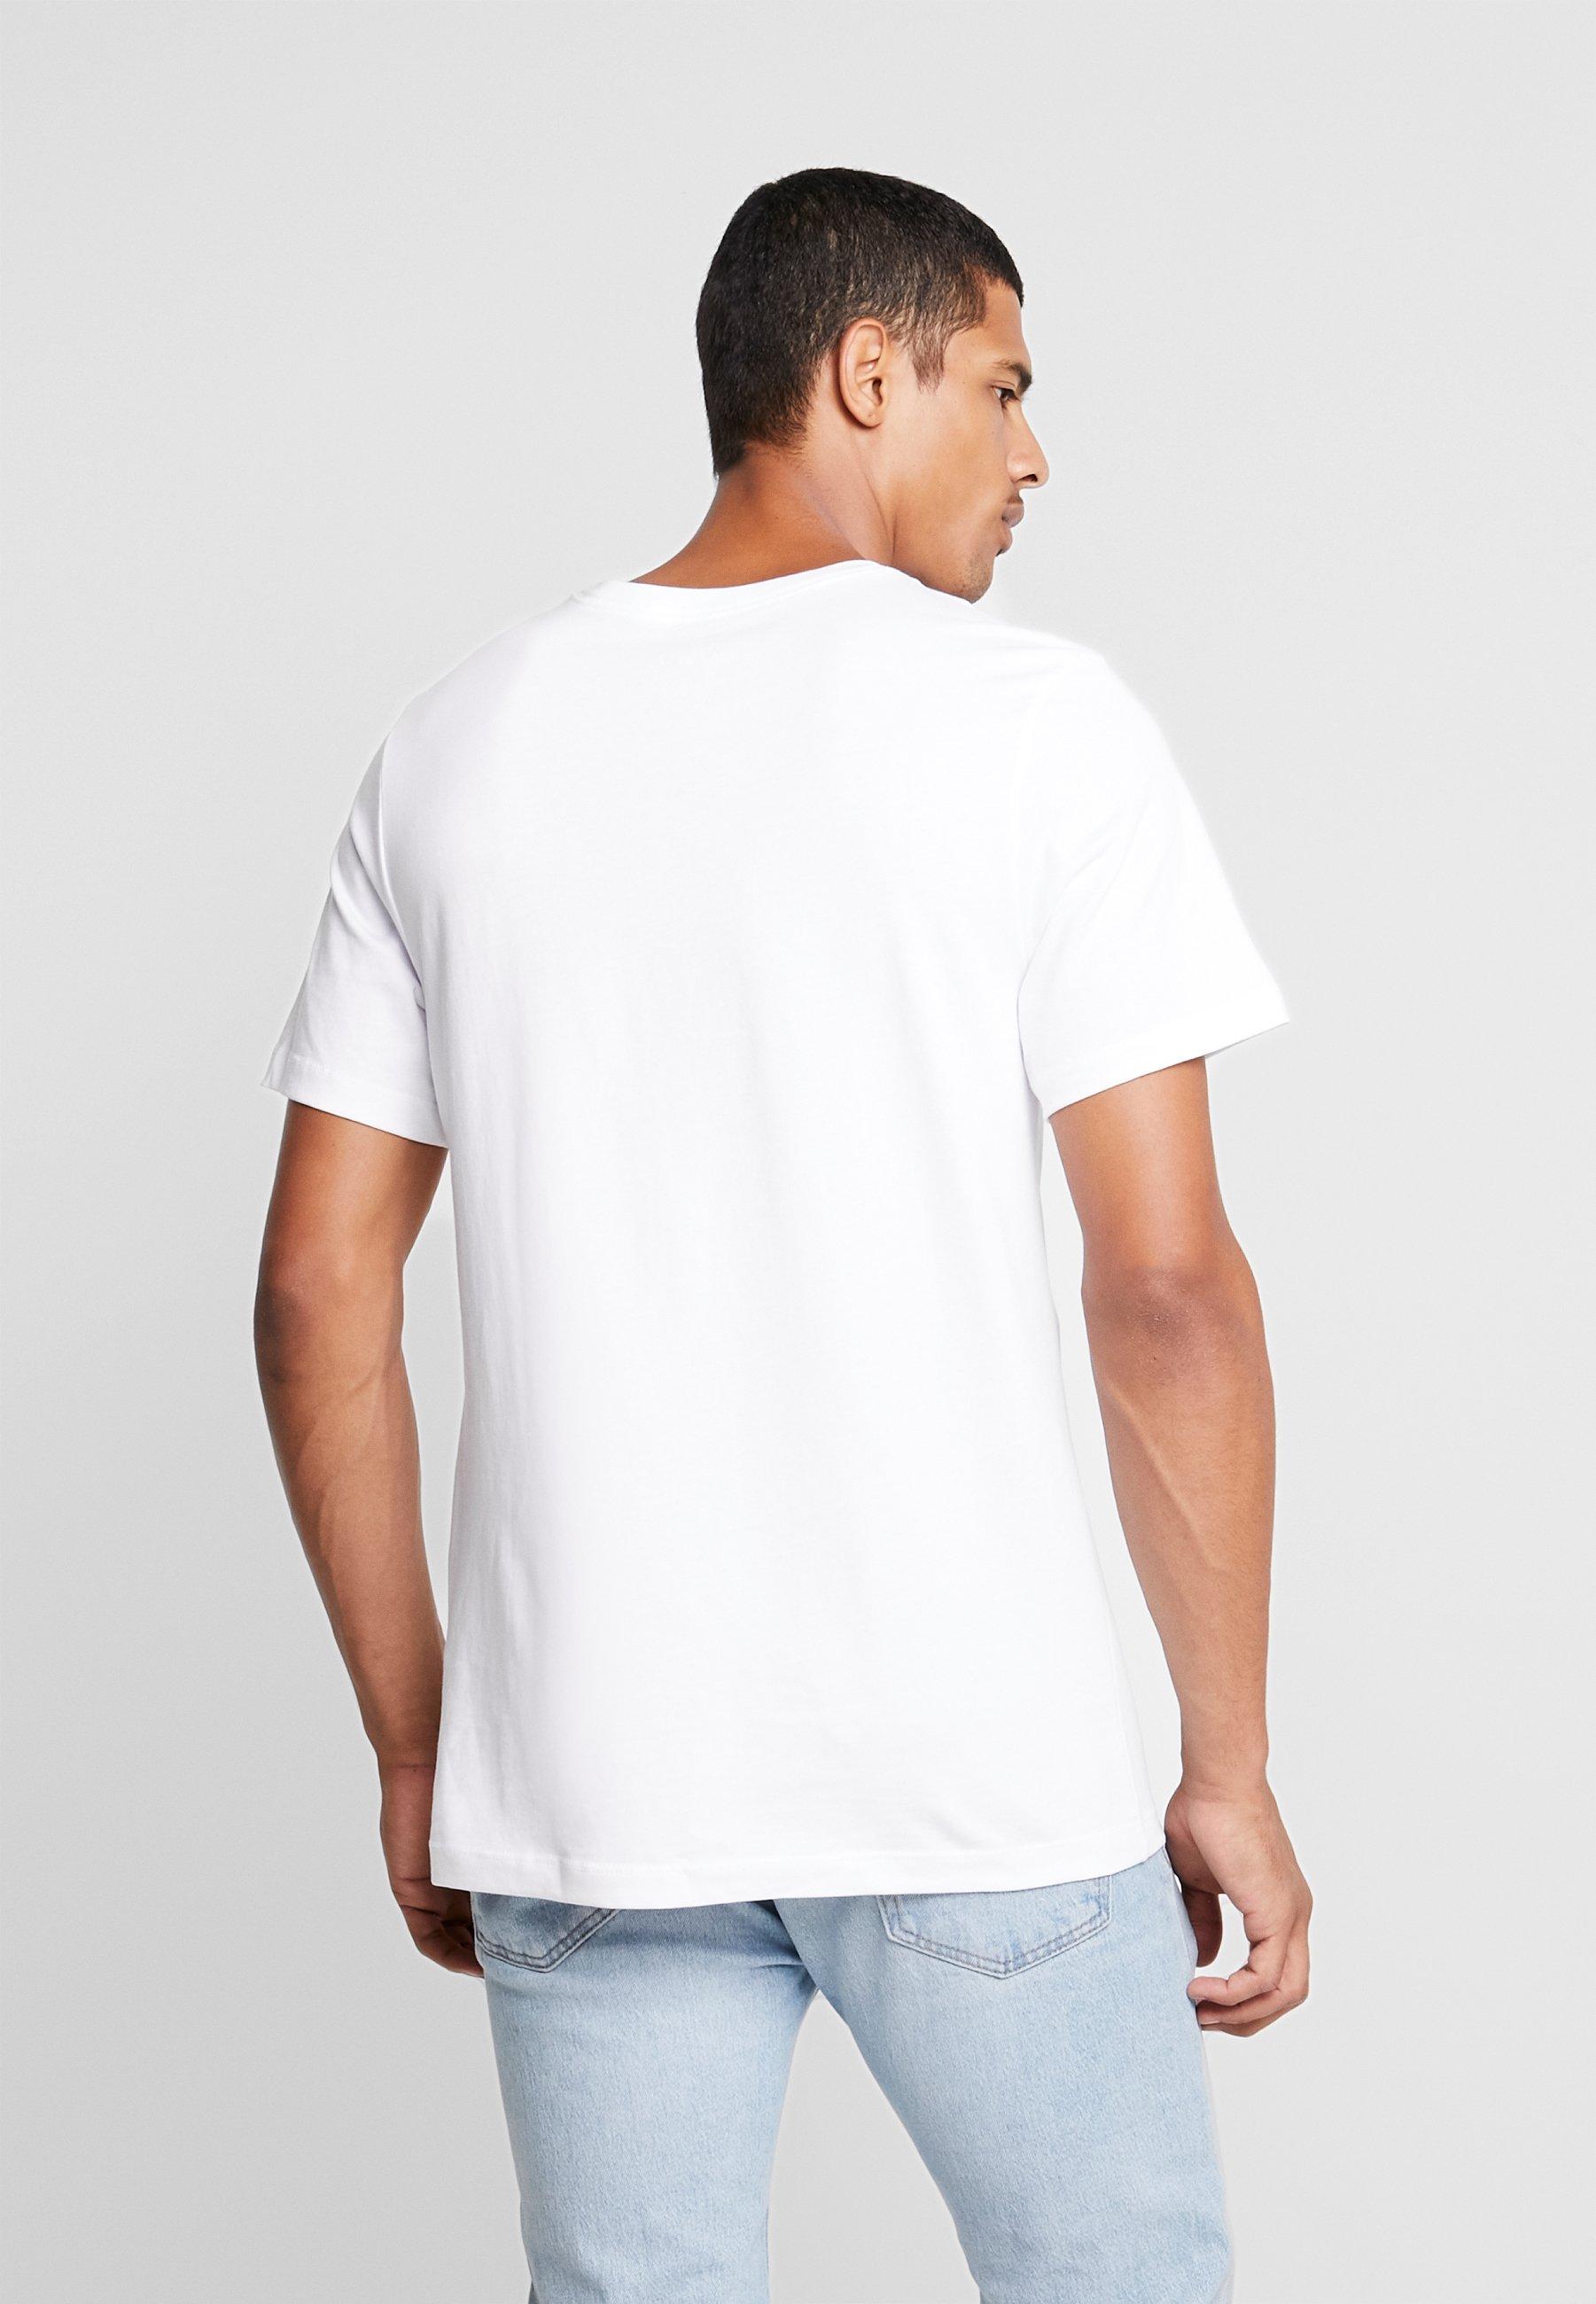 white Nike TEET Shirt Sportswear print gy6vbY7f